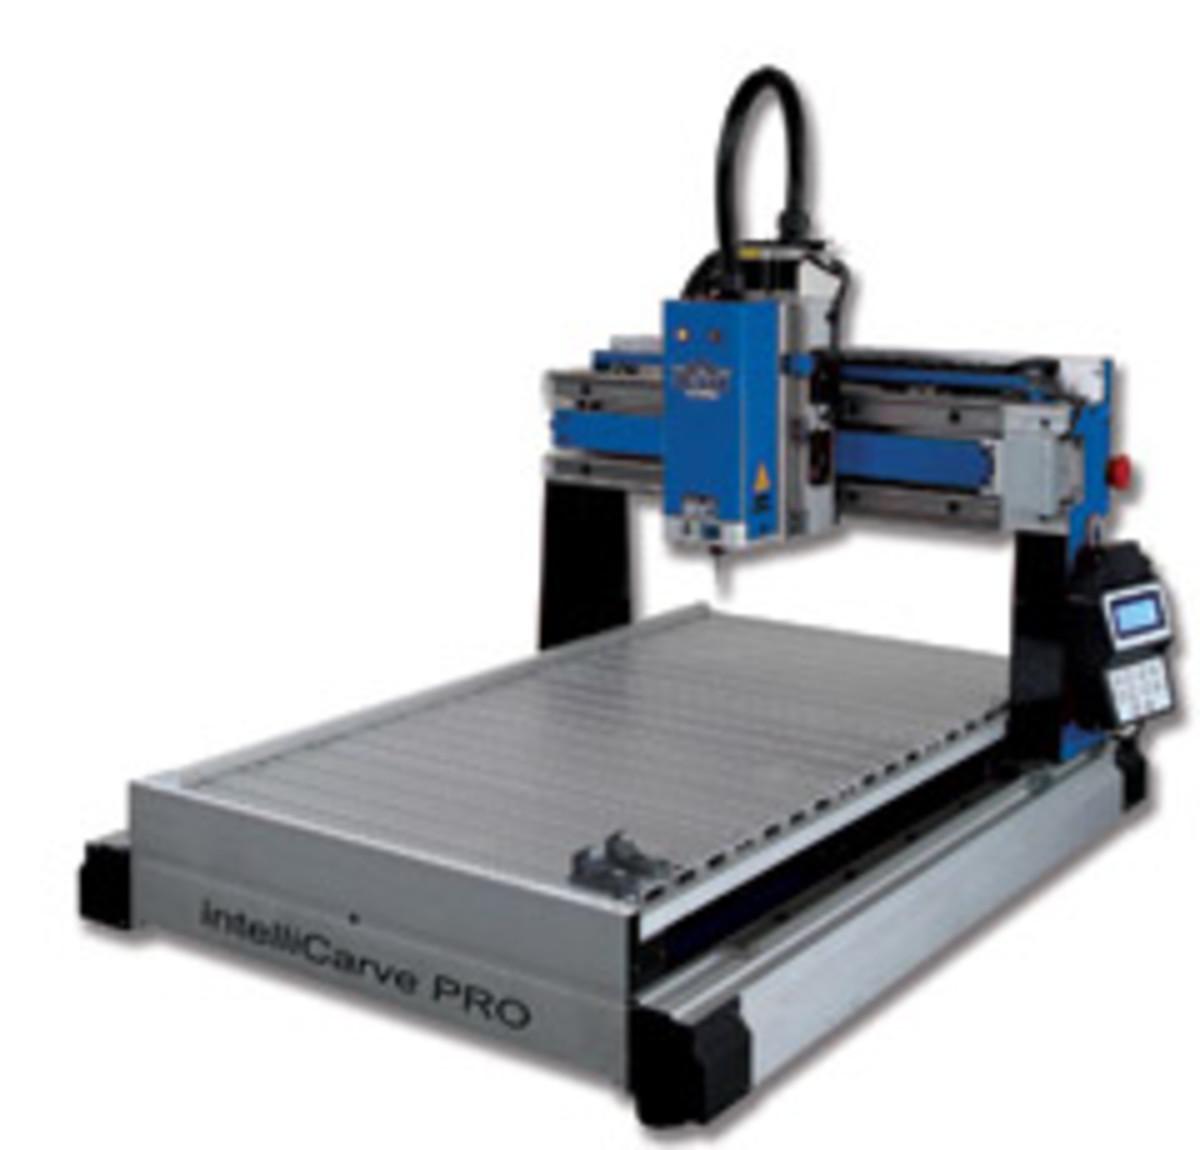 Oliver Machinery's model 1015 IntelliCarve.